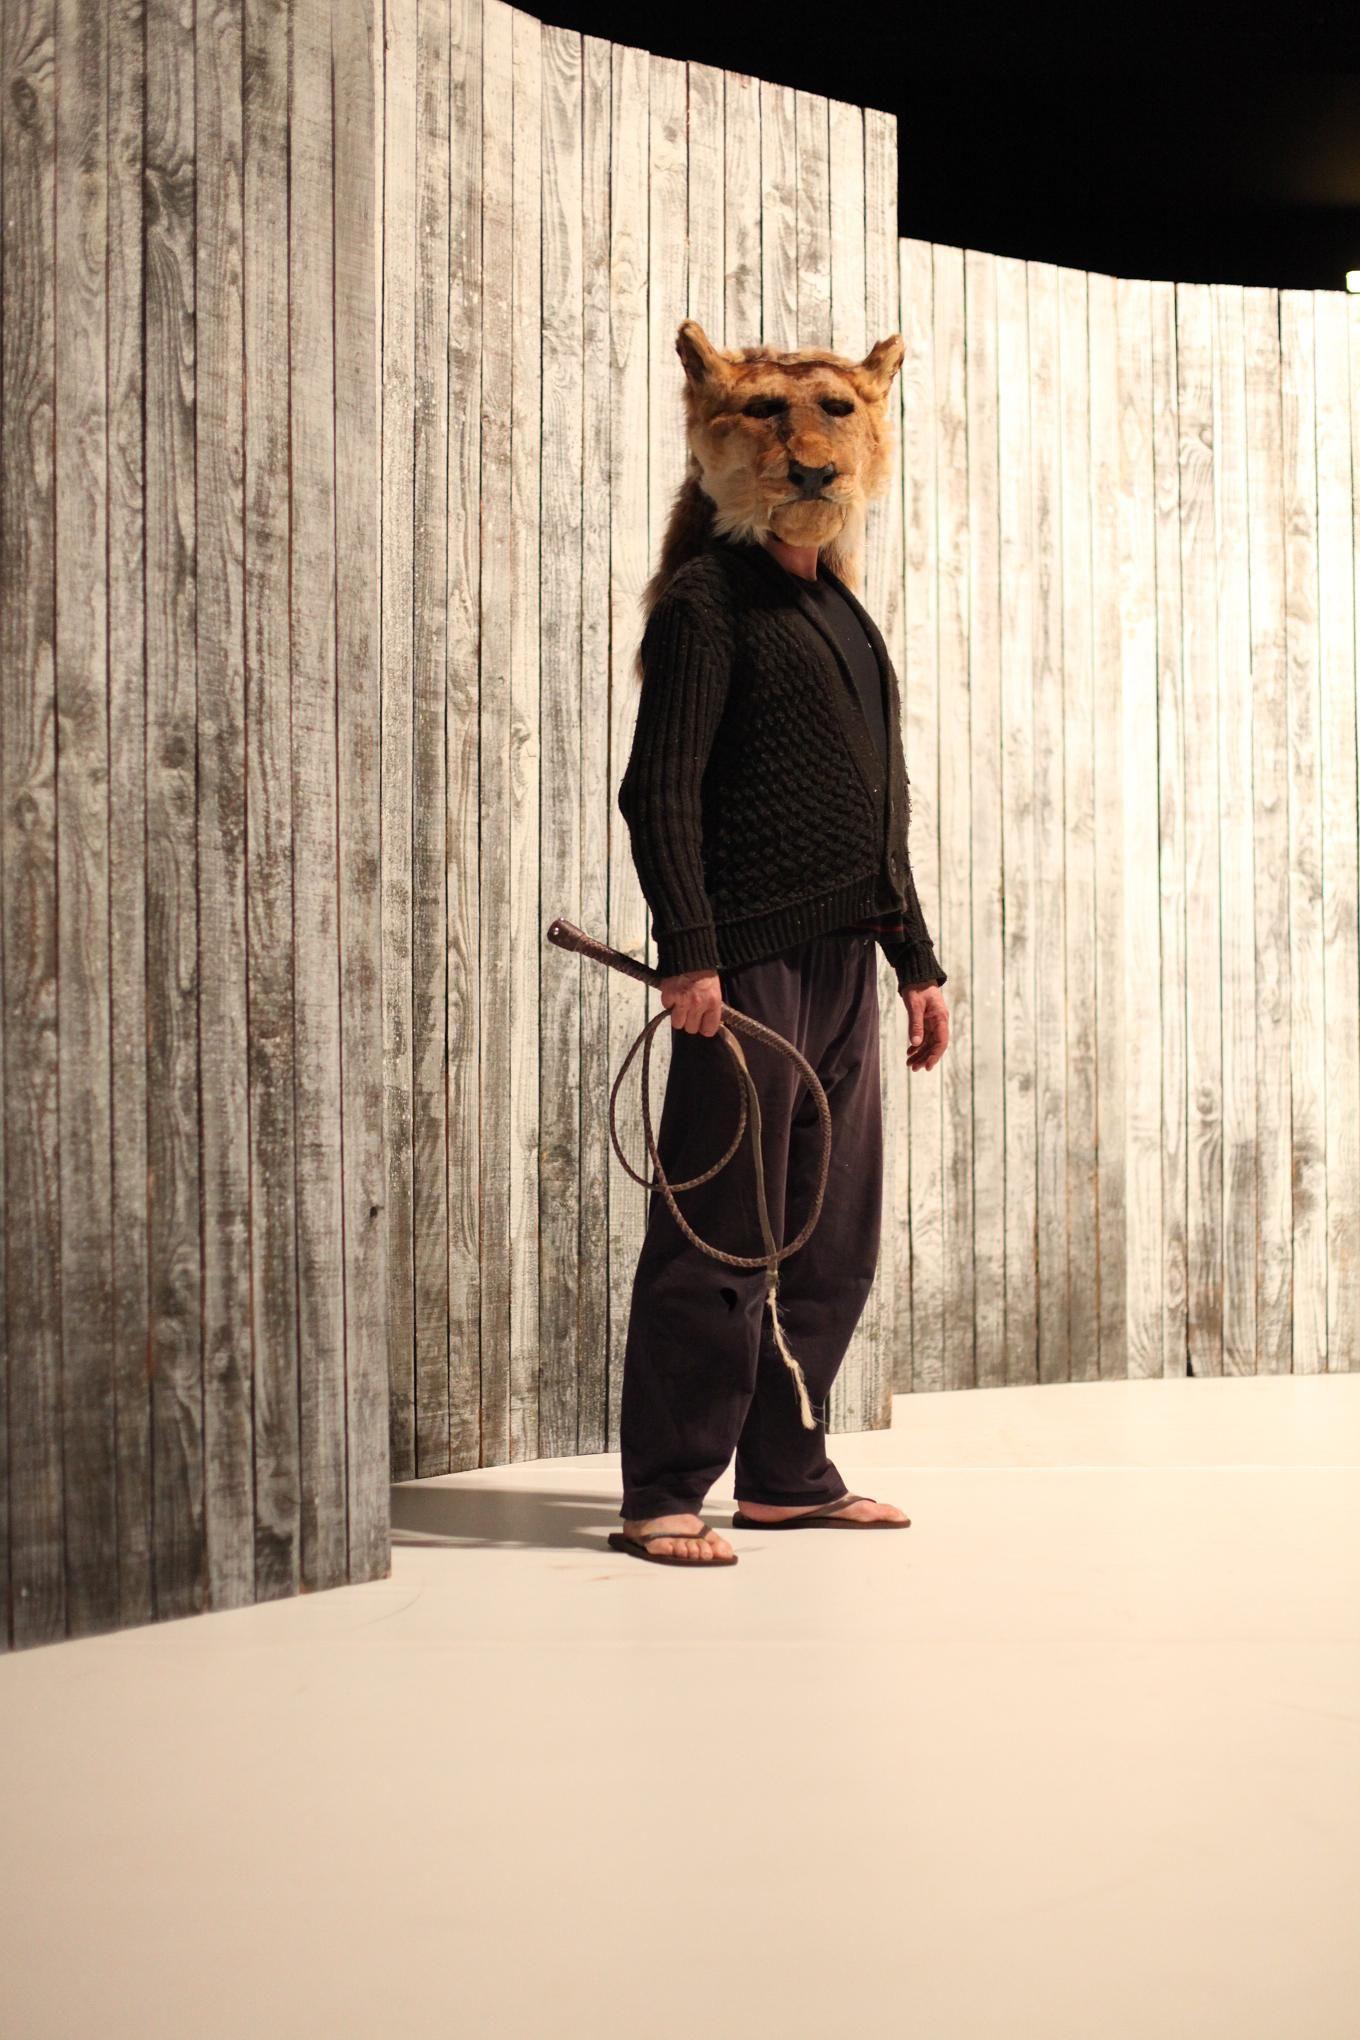 Animal Attraction, Denis Tisseraud / Gilles Baron, 2011 - Theatre